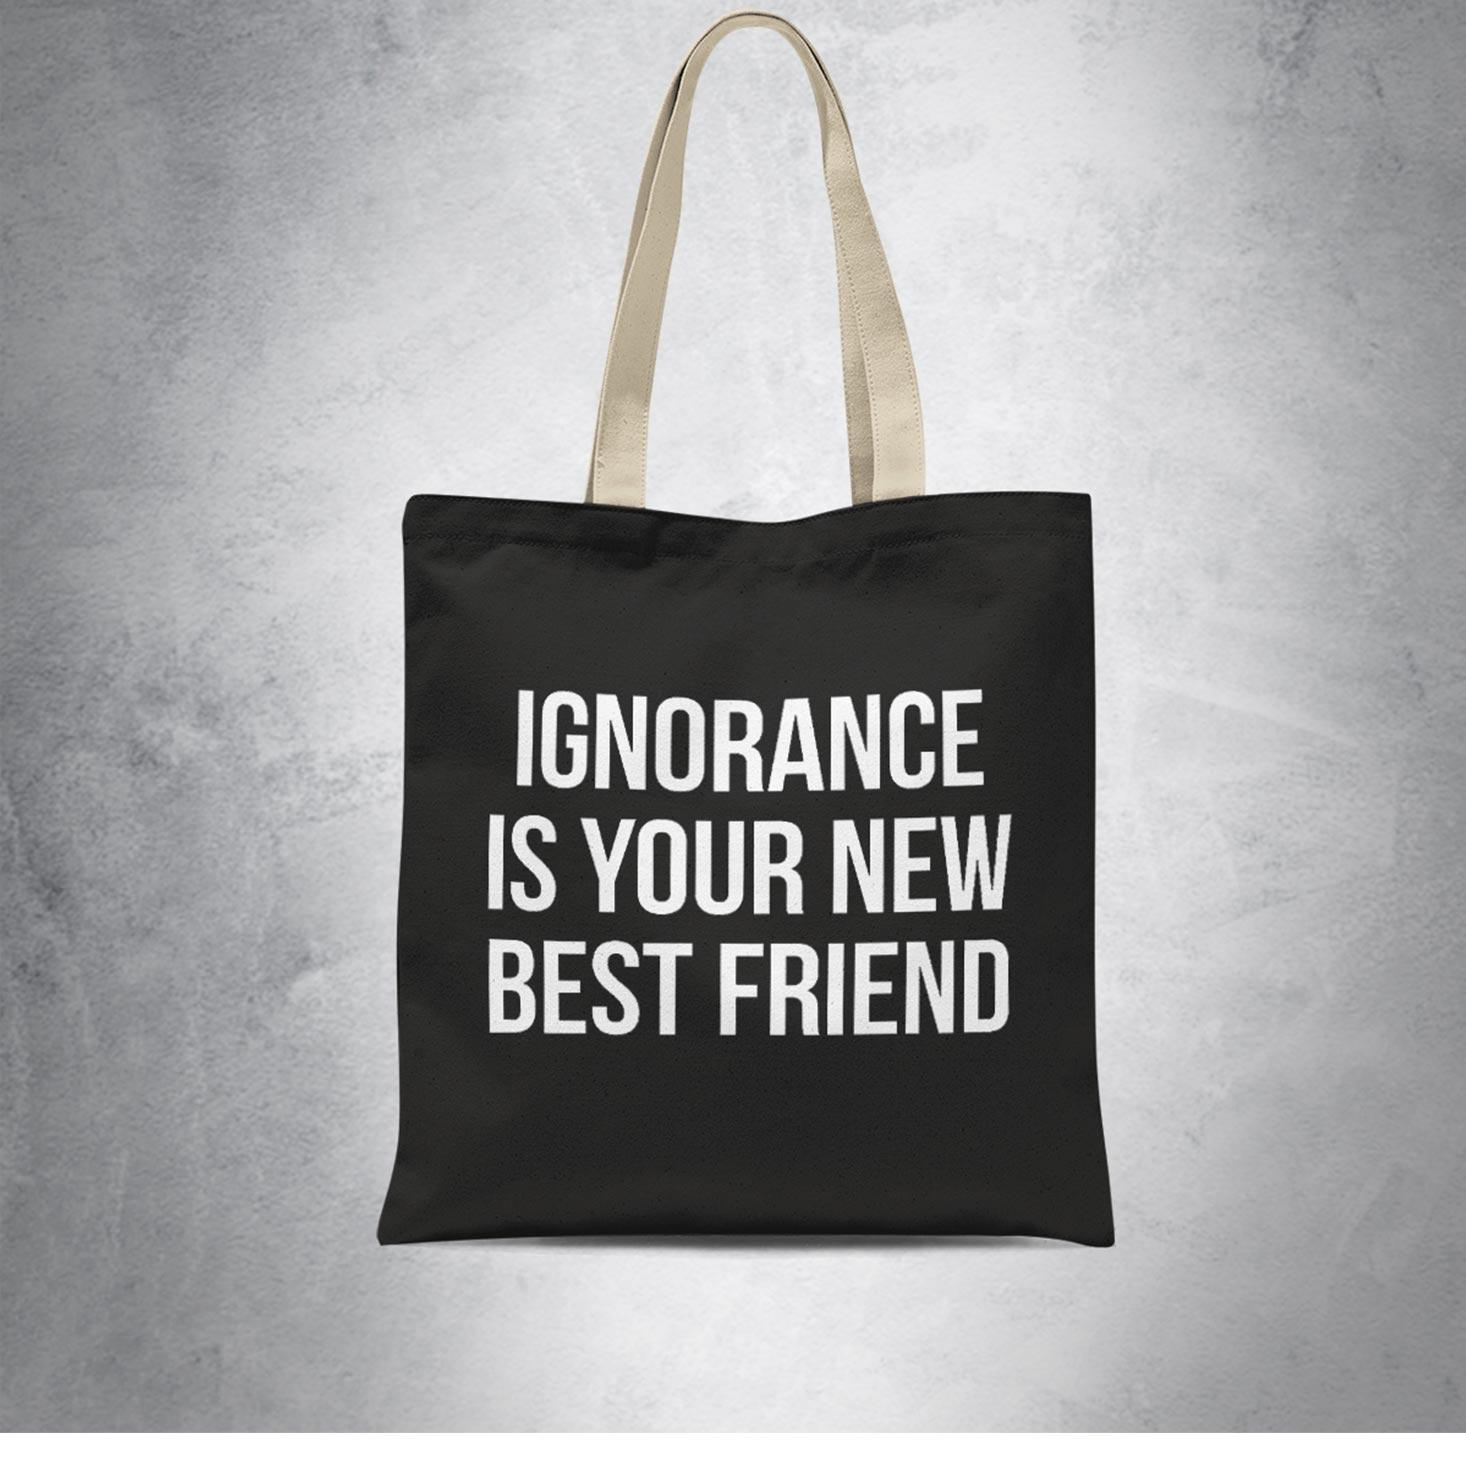 PARAMORE - Ignorance